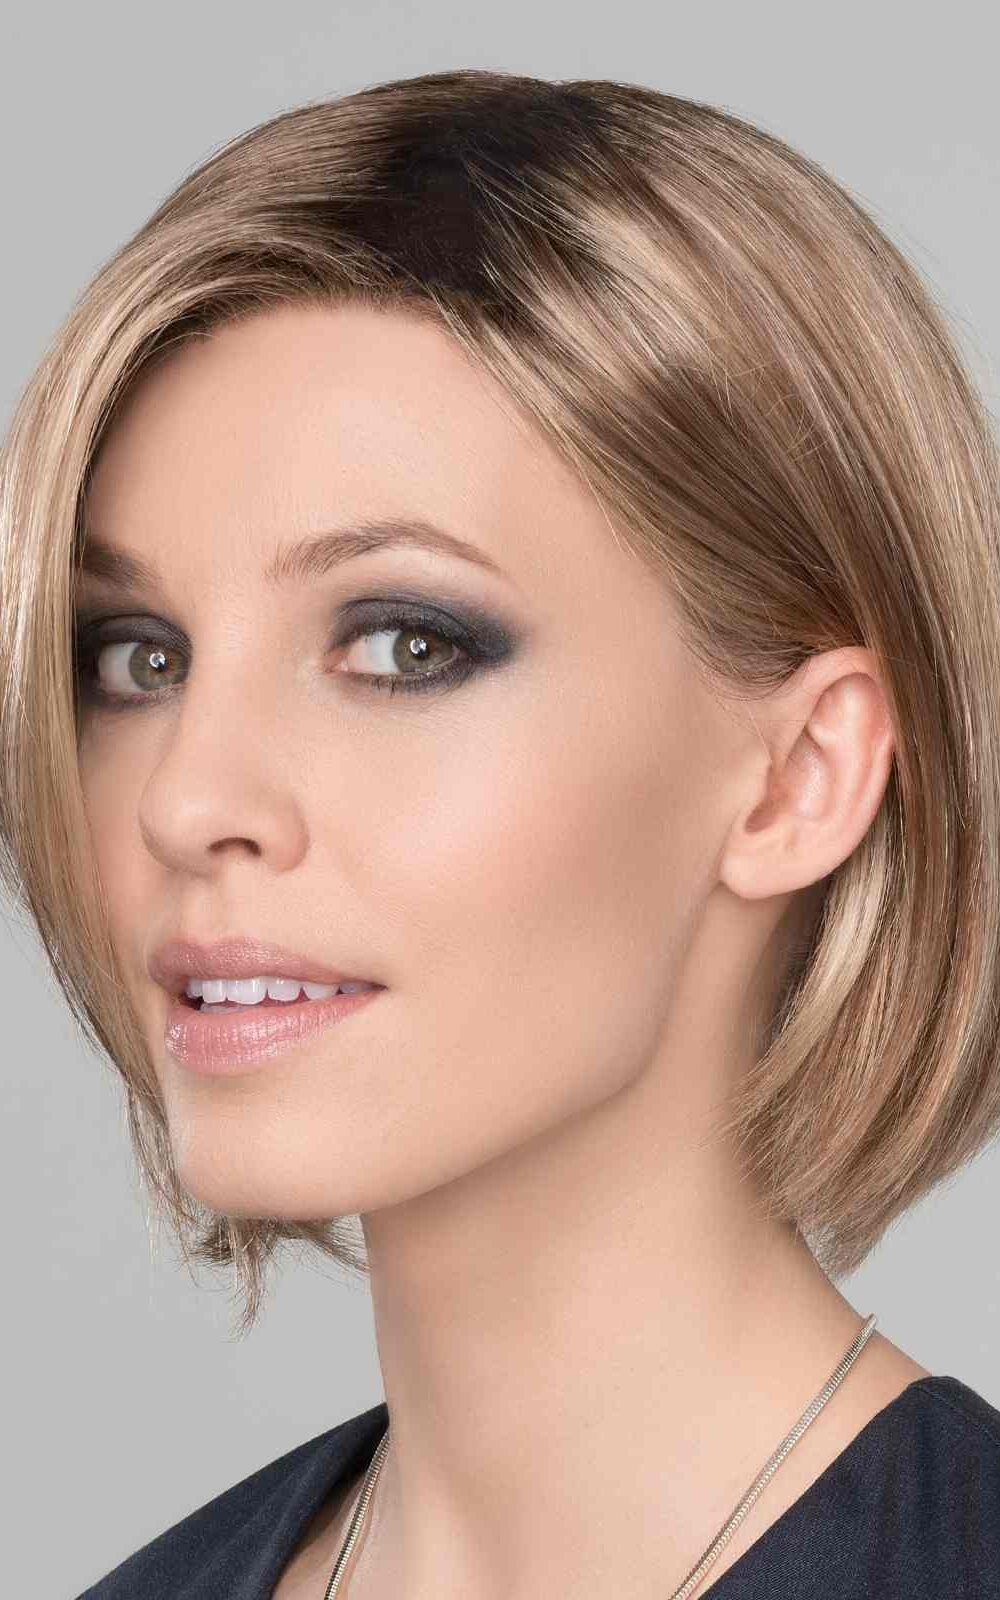 BEST SELLER   Natural side part is sheer to blend with all skin tones   Elly-K.com.au